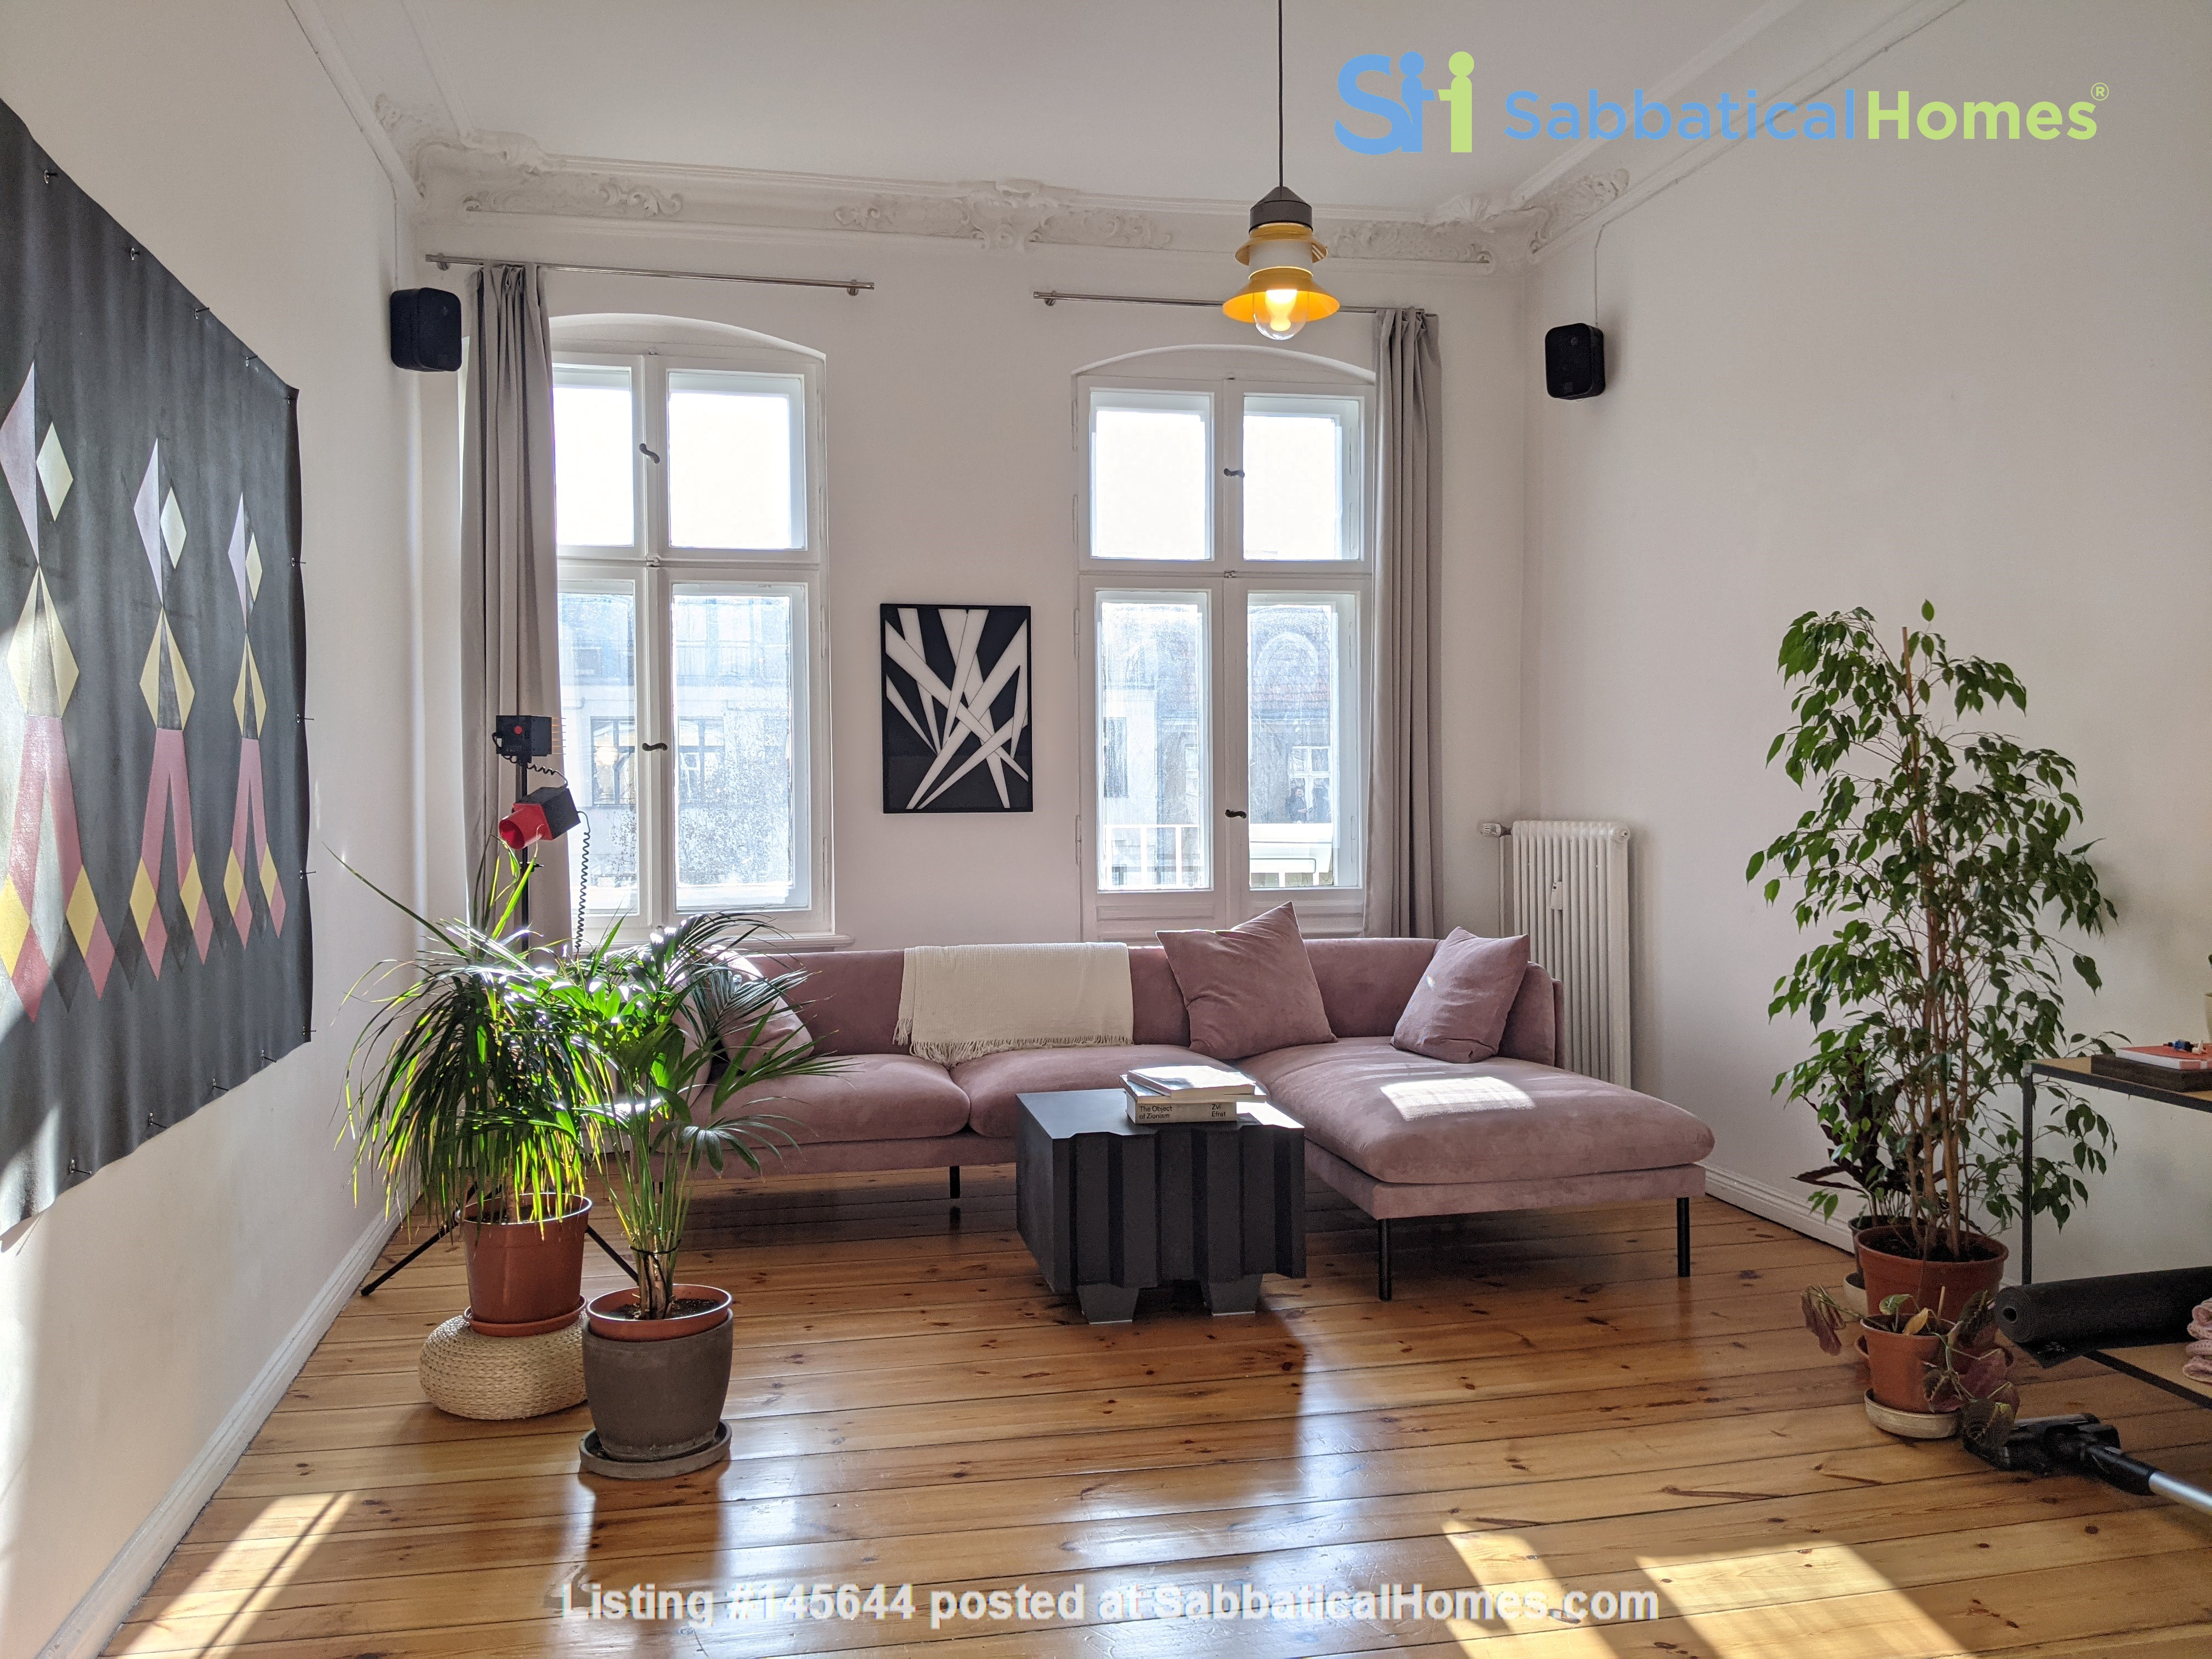 September-November: Your Brooklyn NYC for my Berlin Wedding-Mitte Home Exchange in Berlin, Berlin, Germany 1